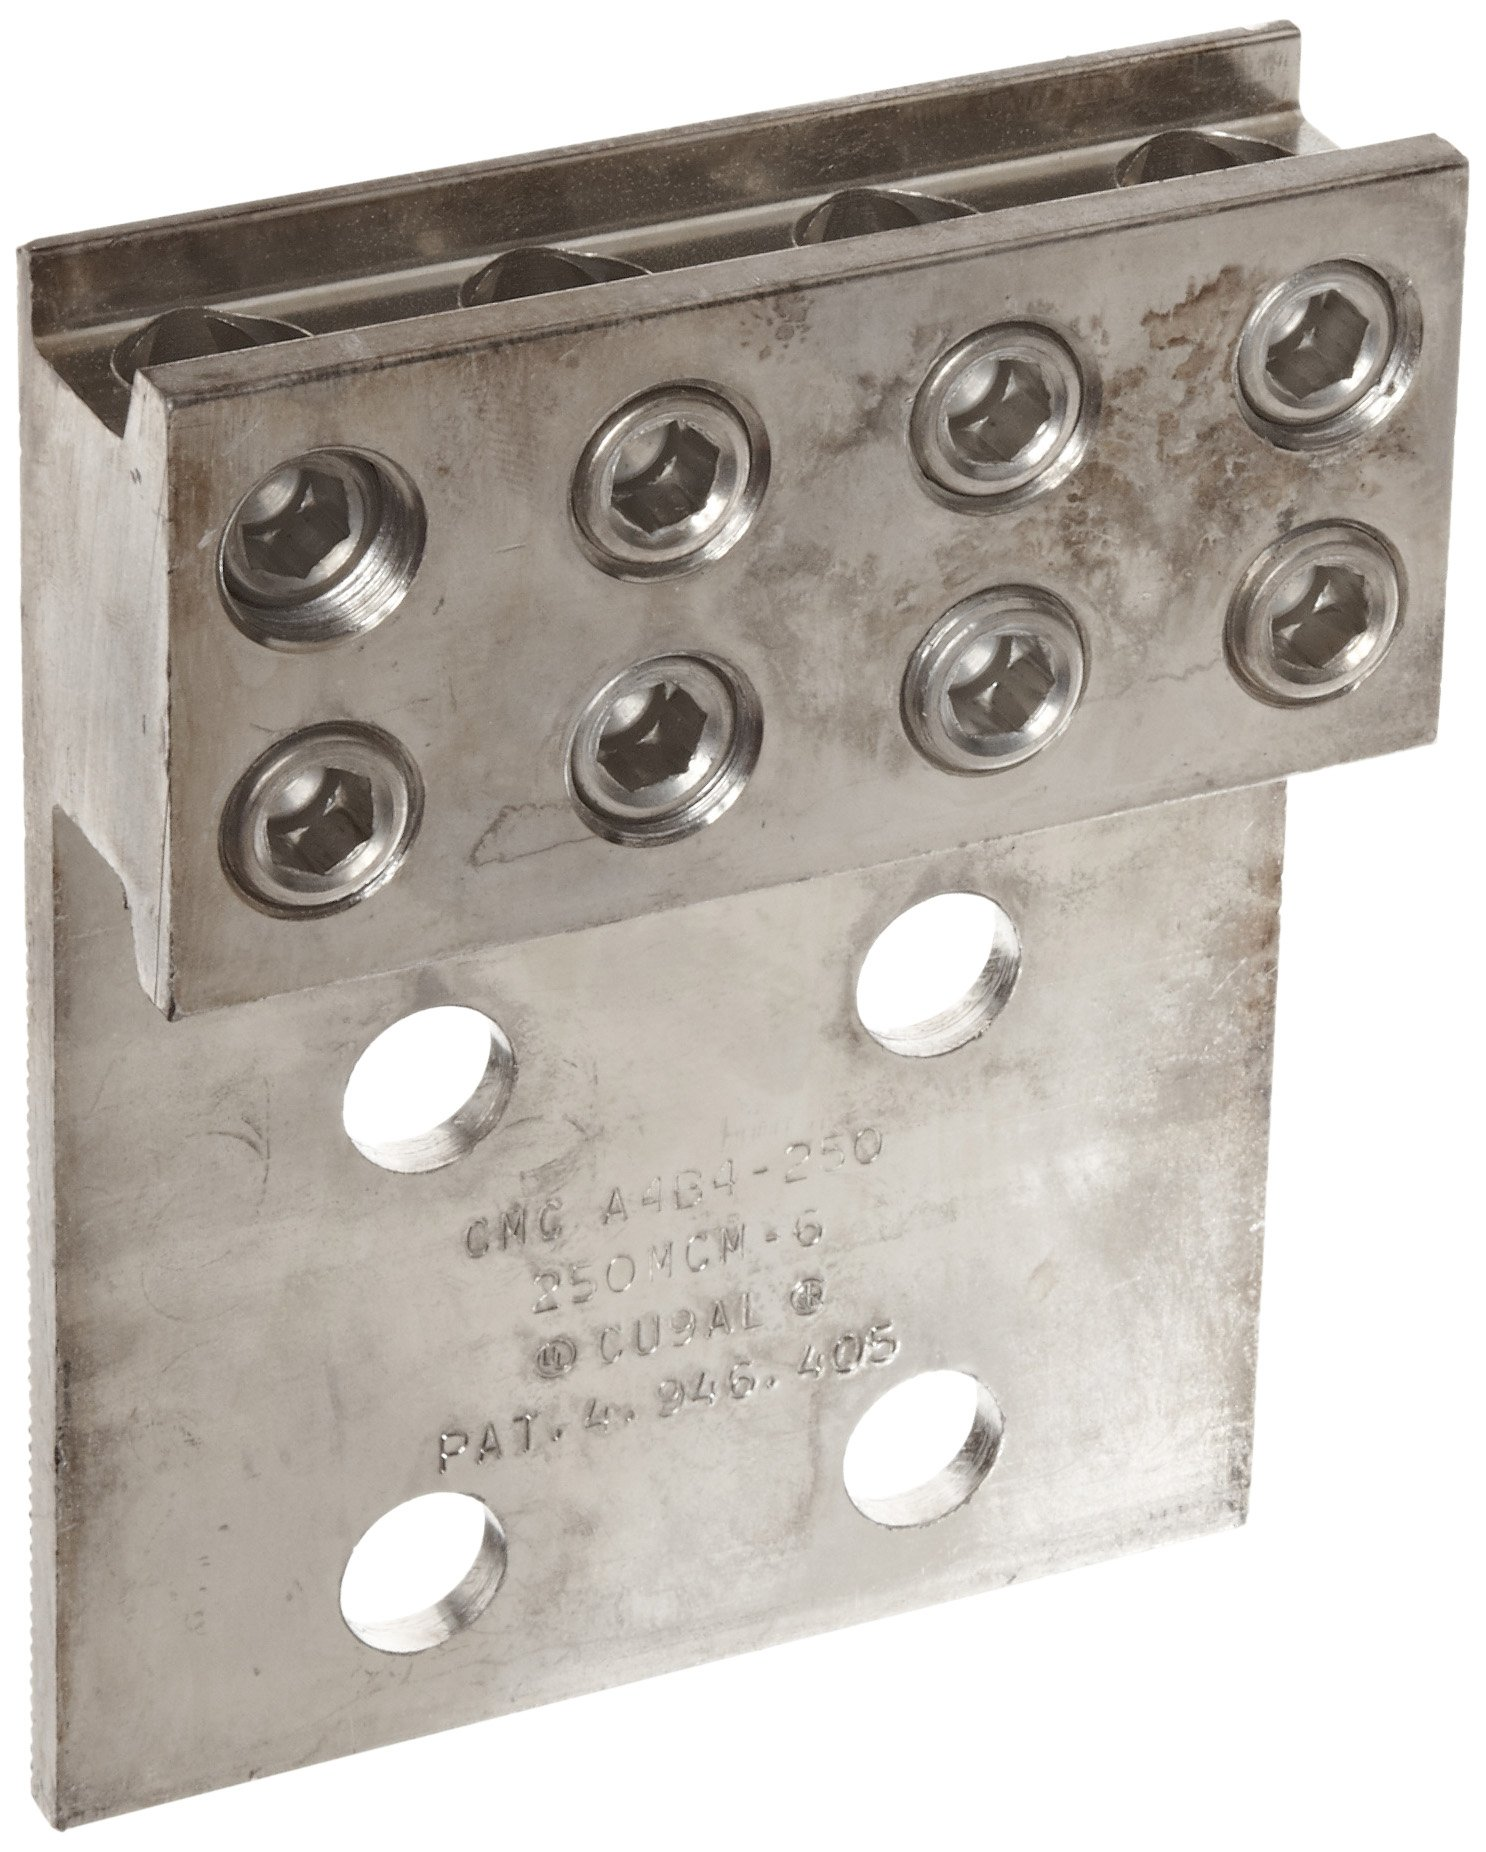 Morris Products 90964 Mechanical Lug, Four Conductors, Four Hole Mount, Aluminum, 250 AWG, 250mcm - 6SOL. Wire Range